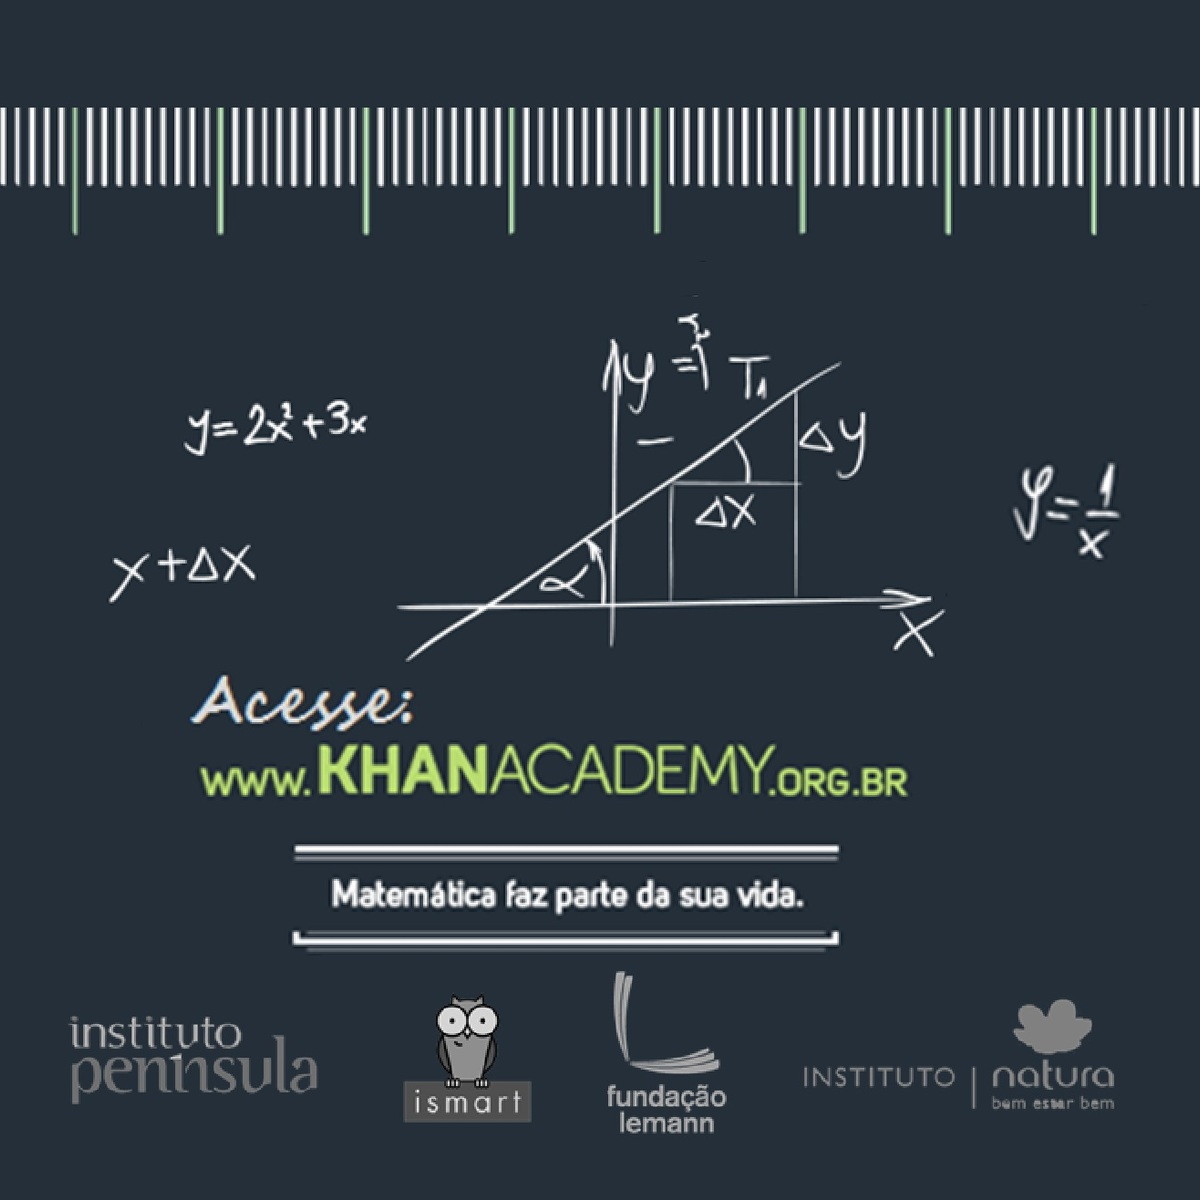 Explorando os recursos educacionais da Khan Academy course image